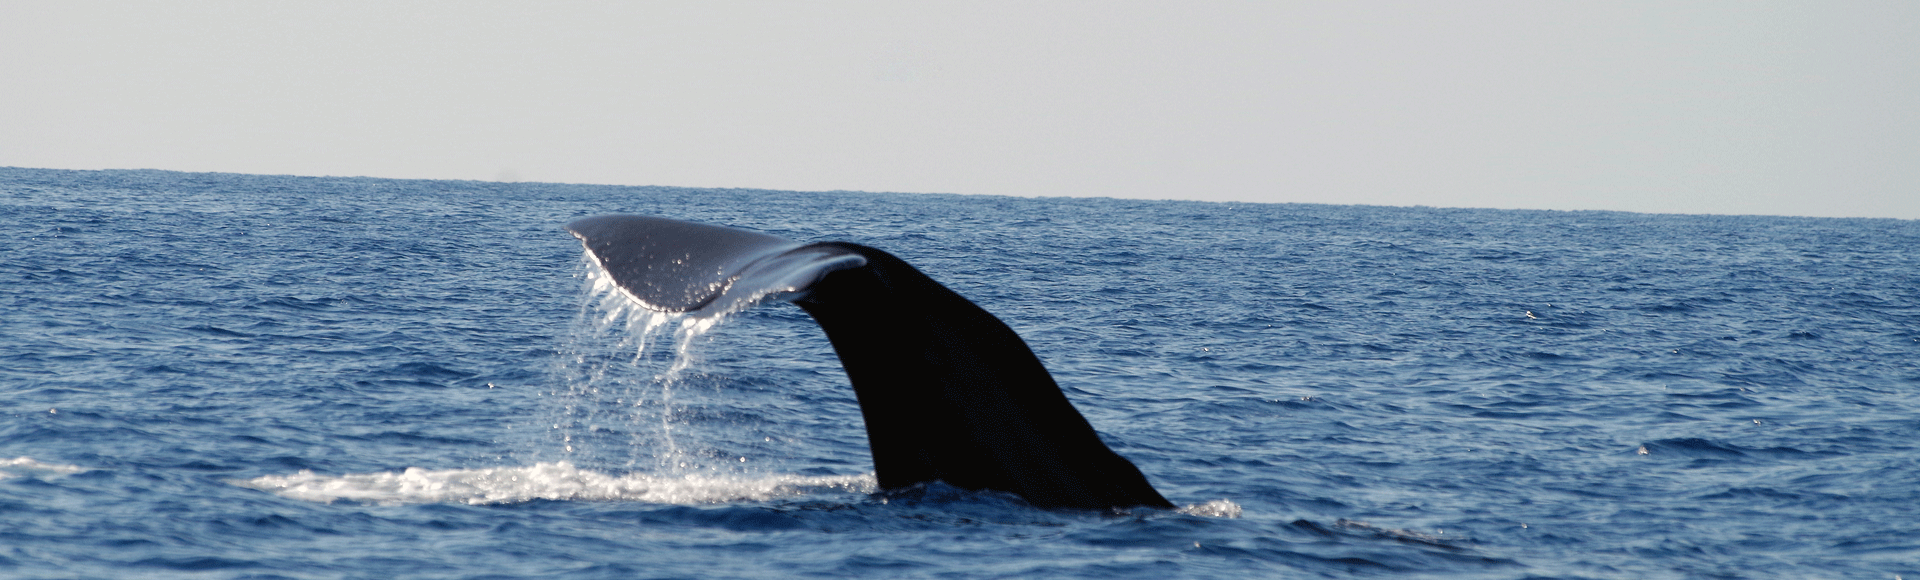 cachalot-de-mediterranee